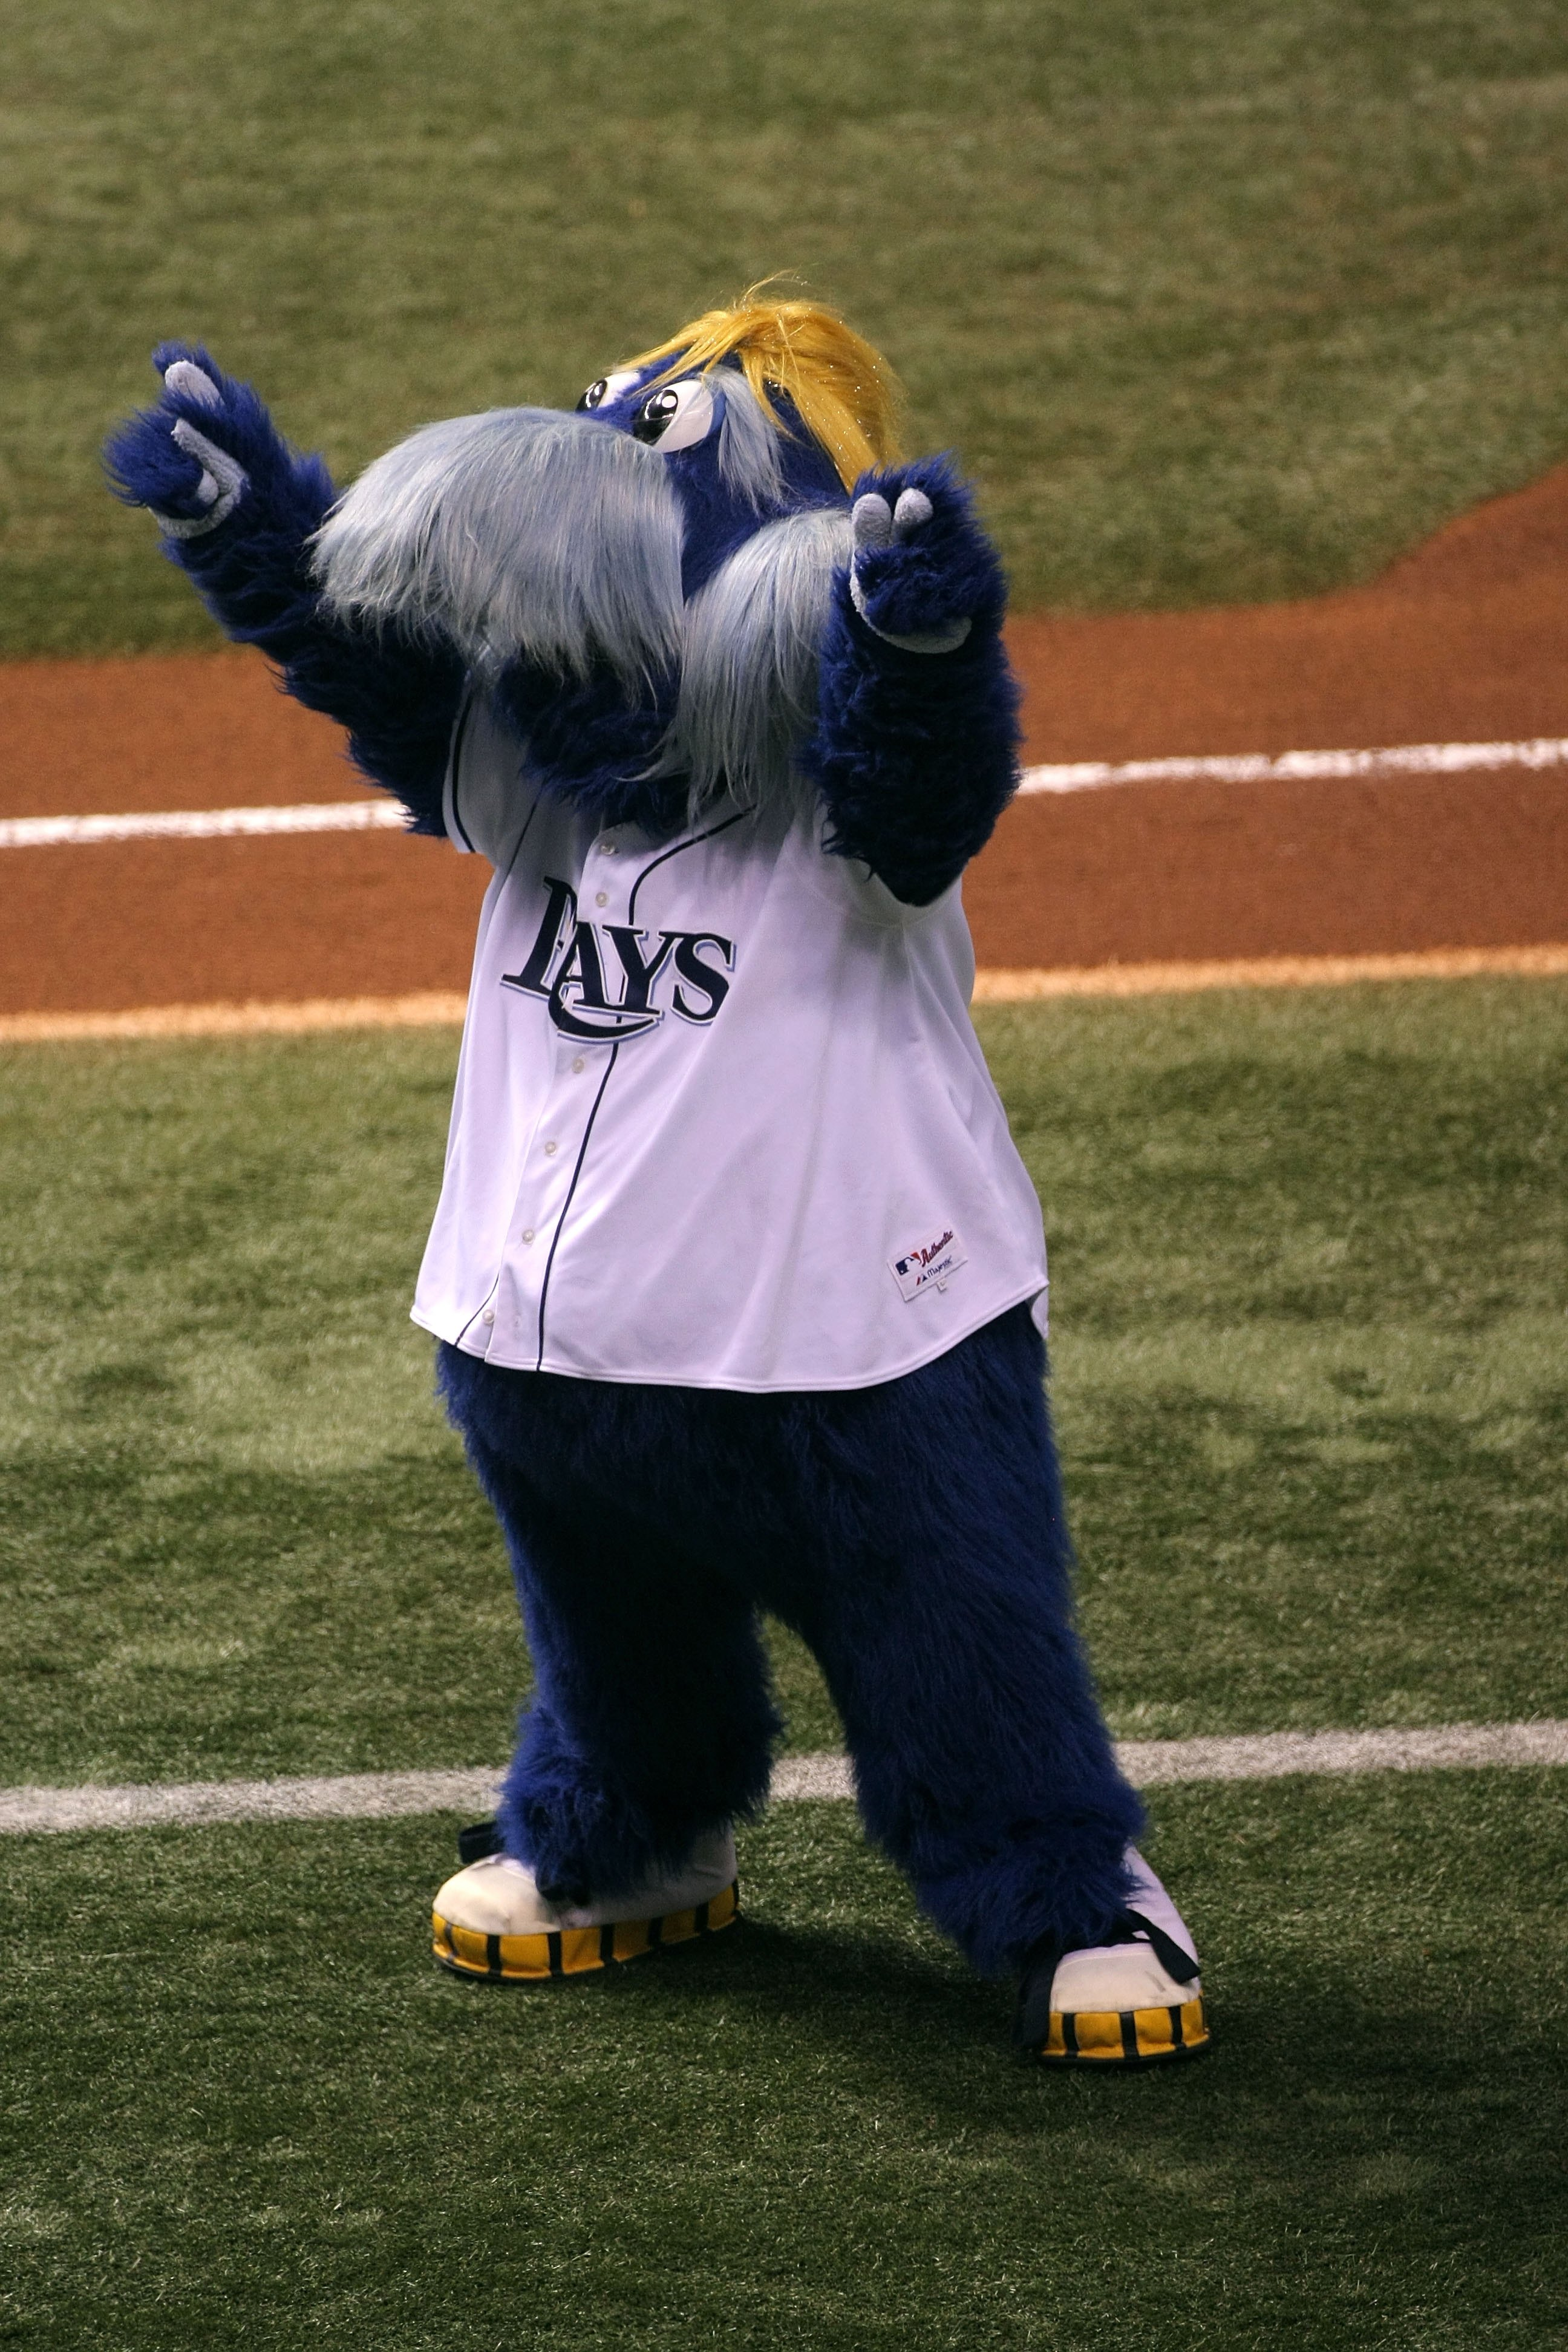 World Series: Philadelphia Phillies v Tampa Bay Rays, Game 2